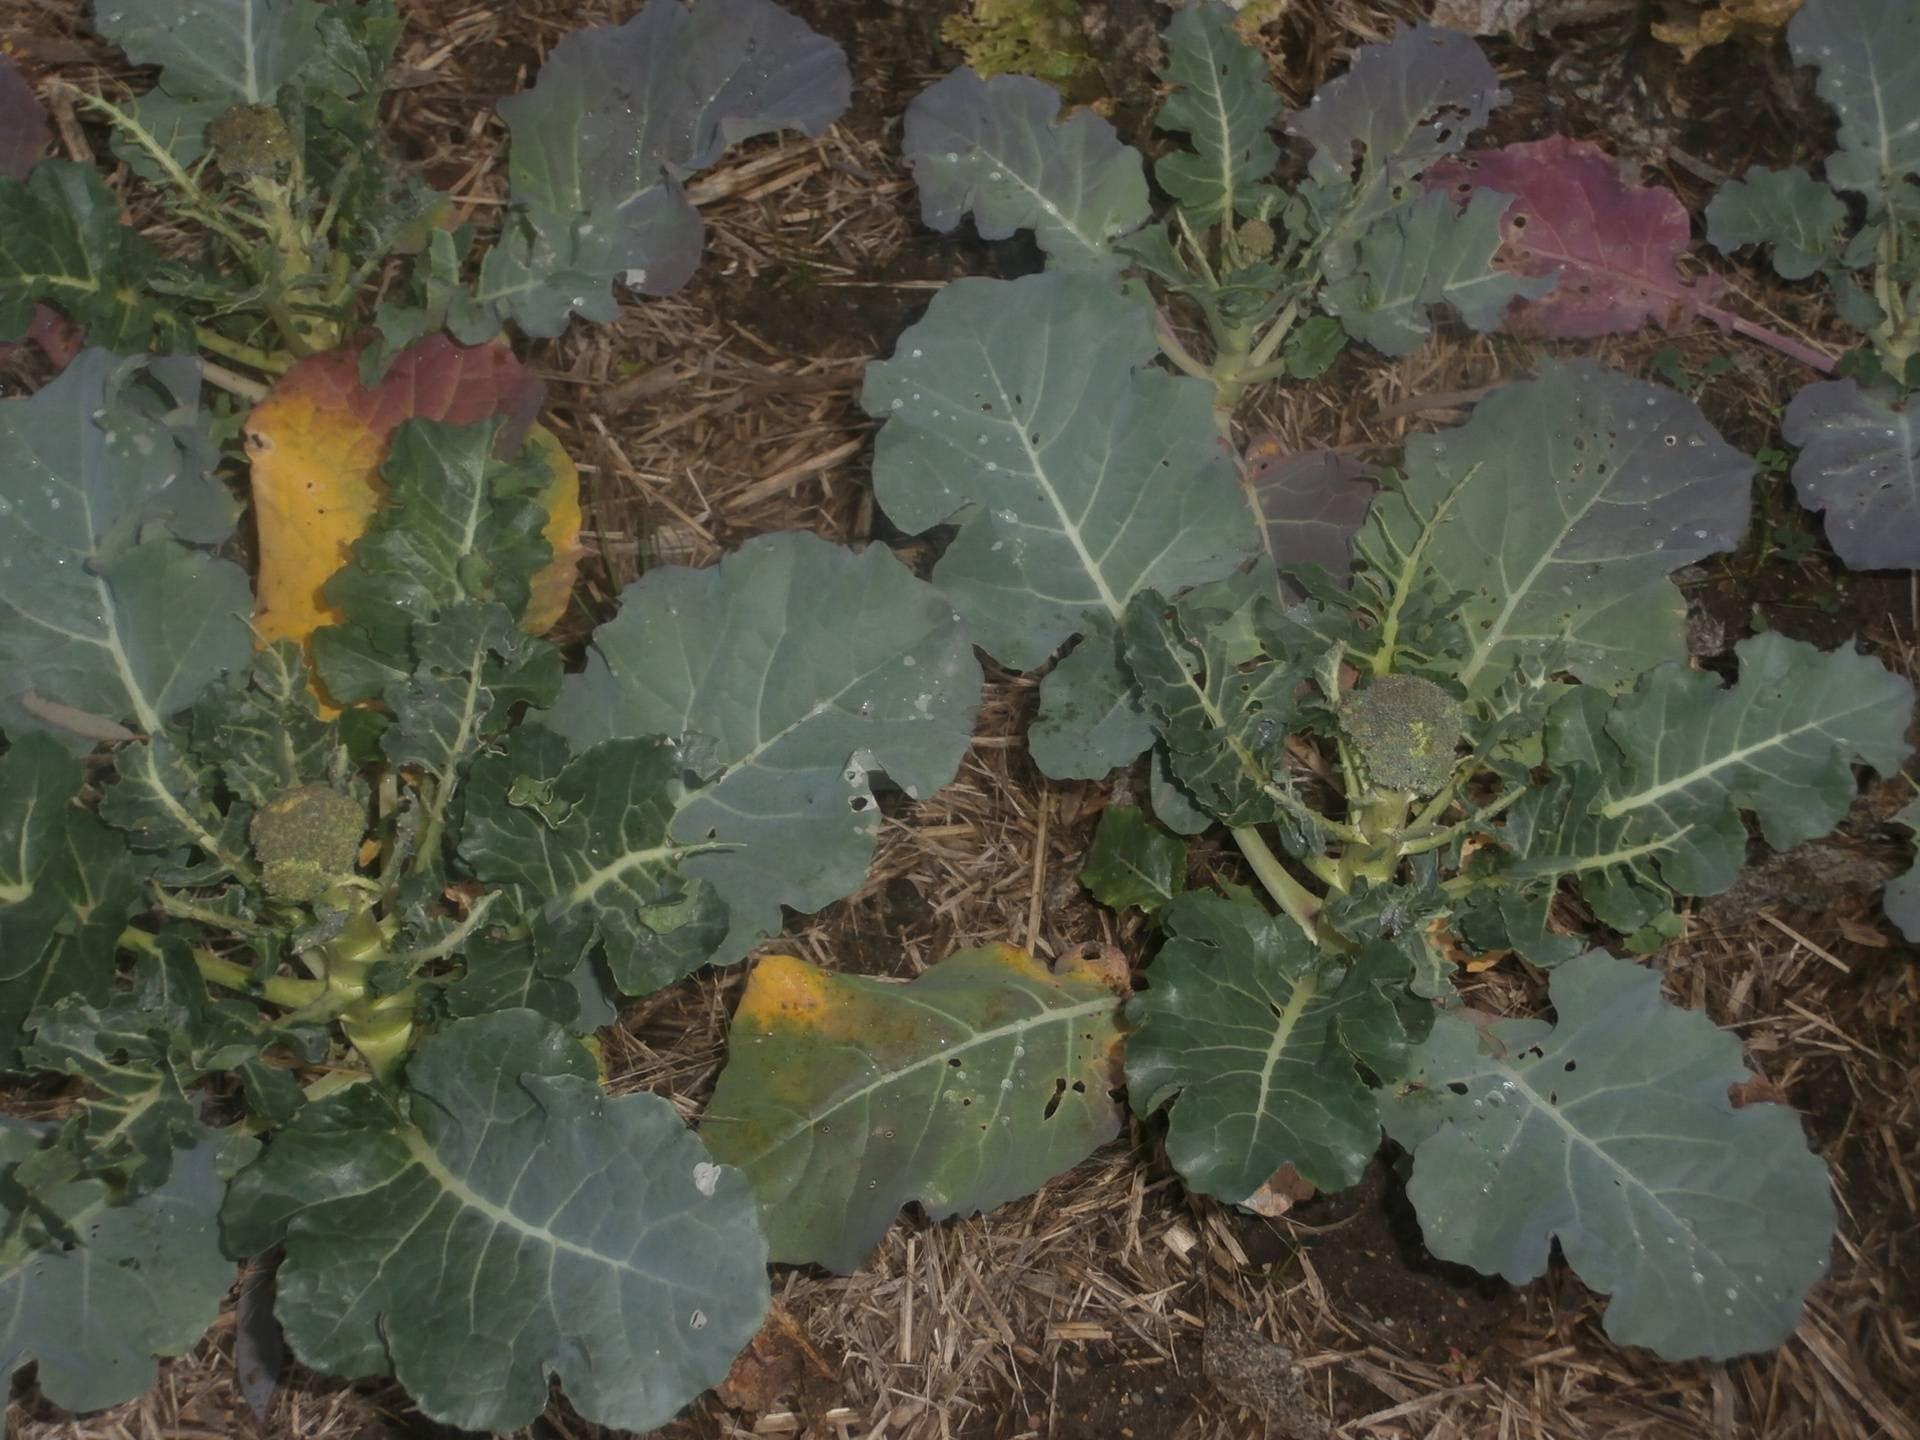 Brocolli Cabbage and Cauli's going well